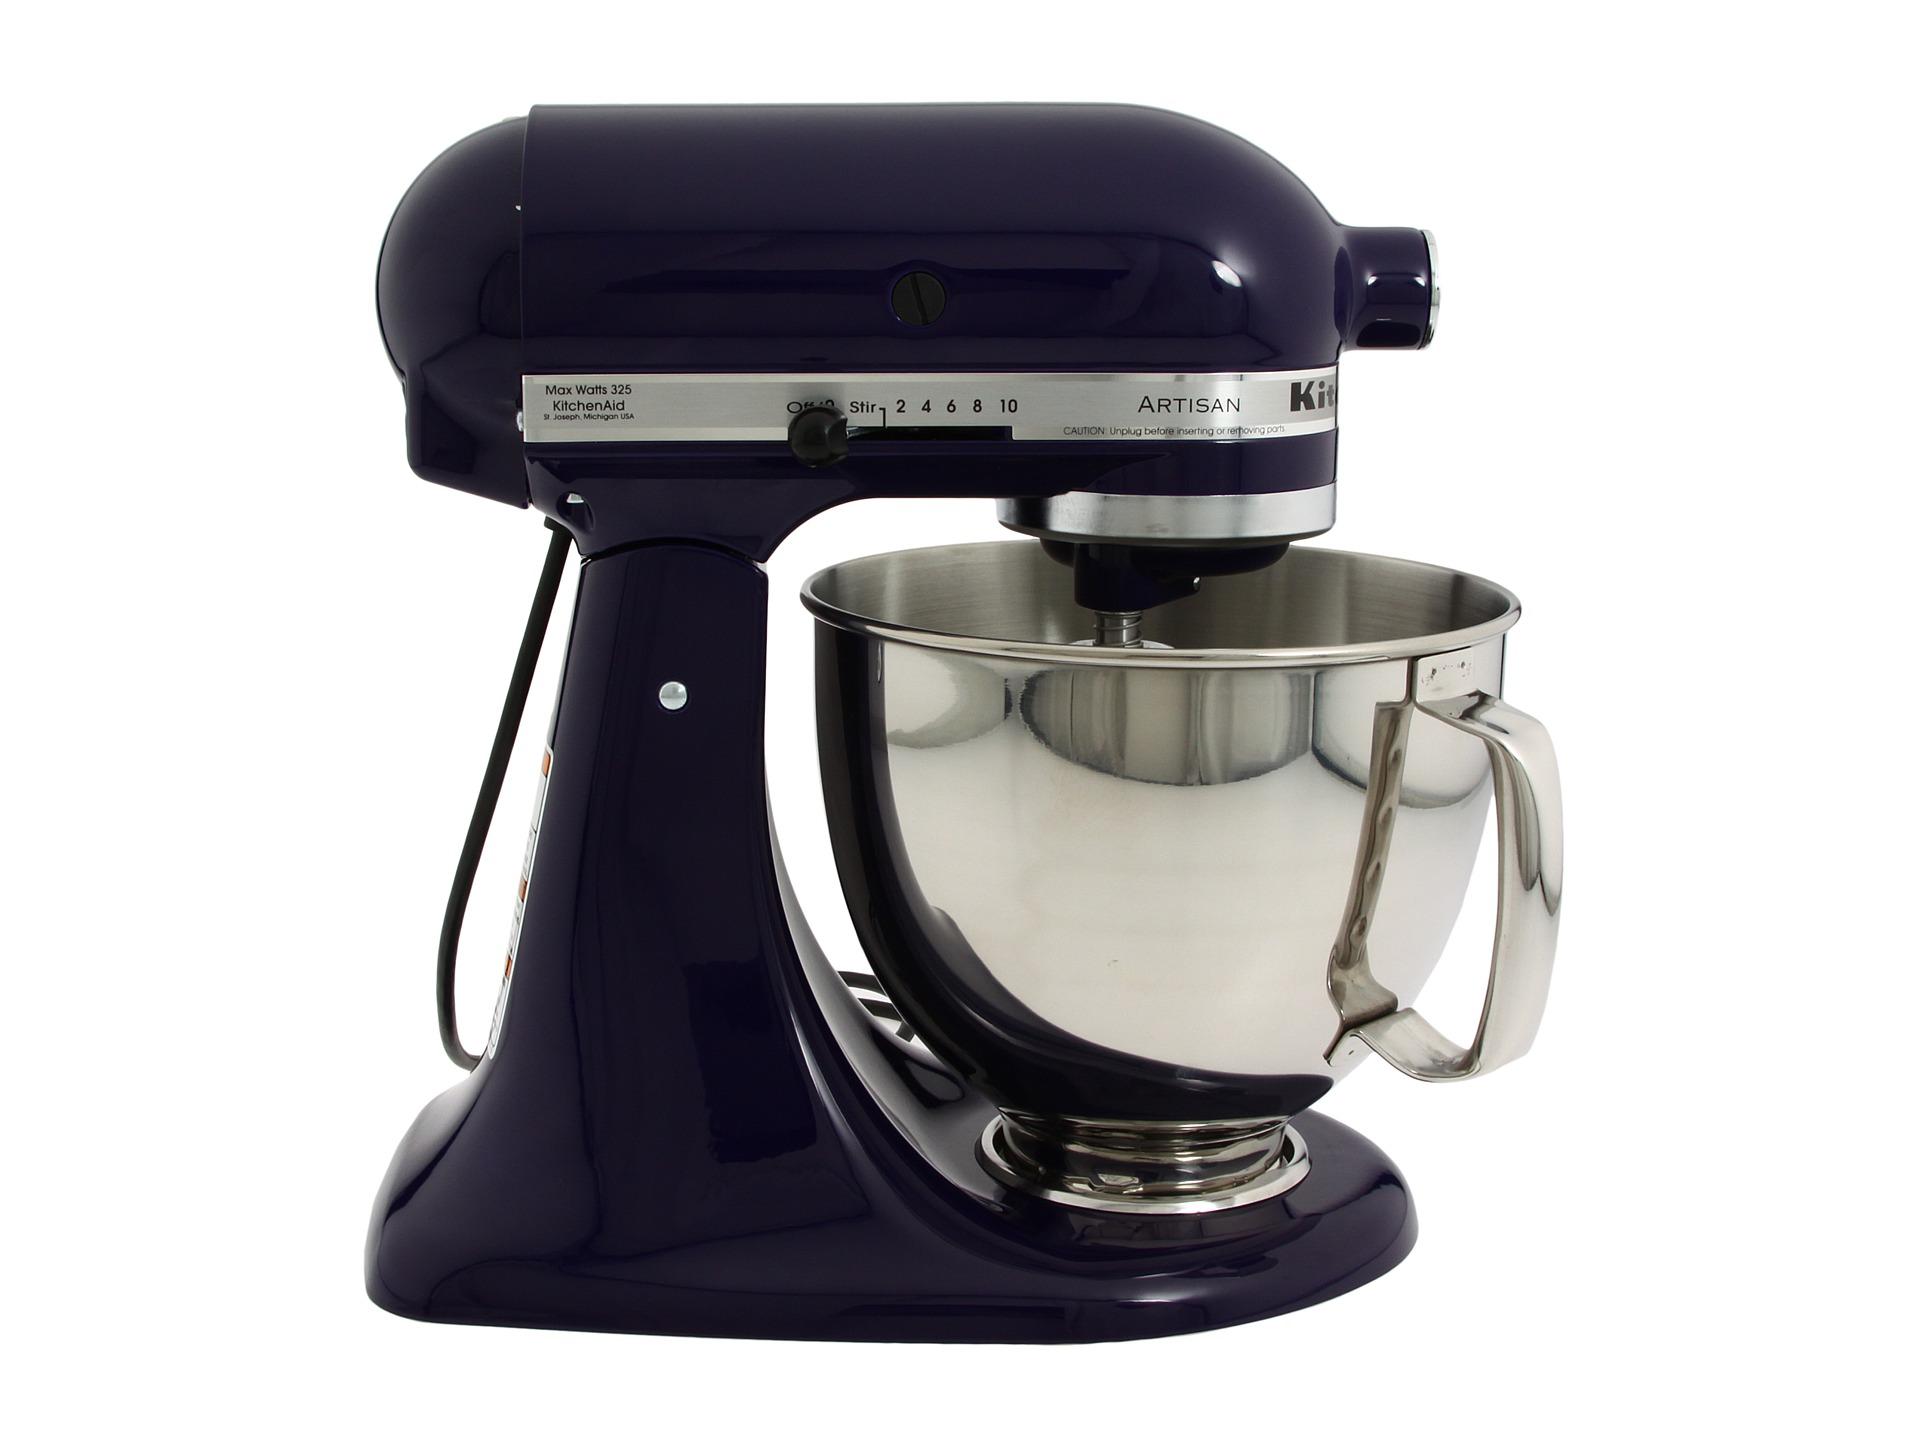 Kitchenaid ksm150p 5 quart artisan stand mixer shipped free at zappos - Kitchenaid artisan qt stand mixer sale ...